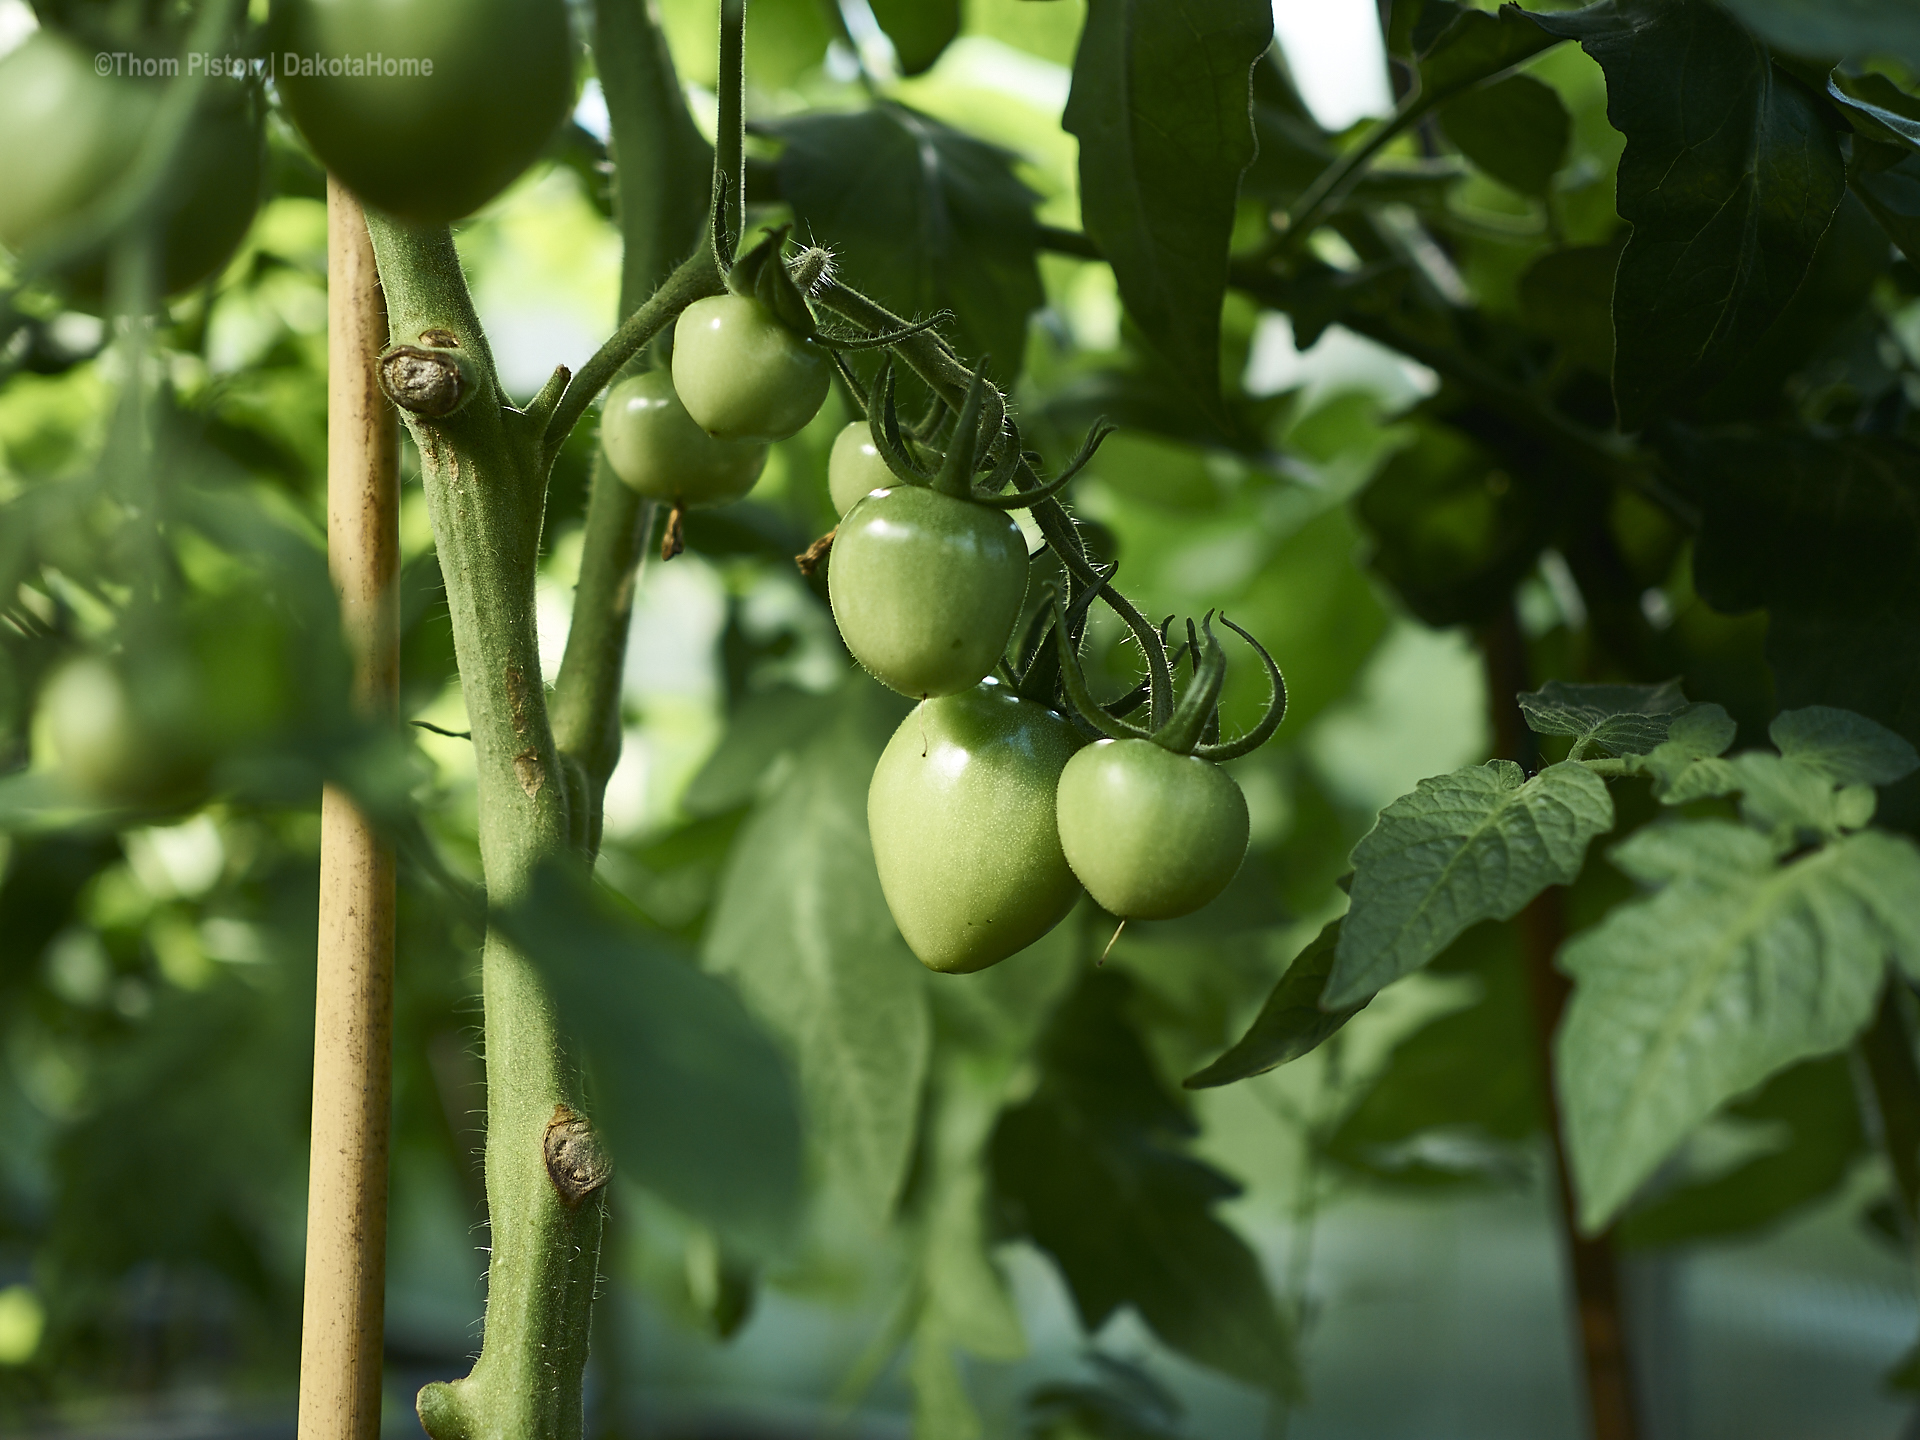 fioradade californische tomate at dakota home